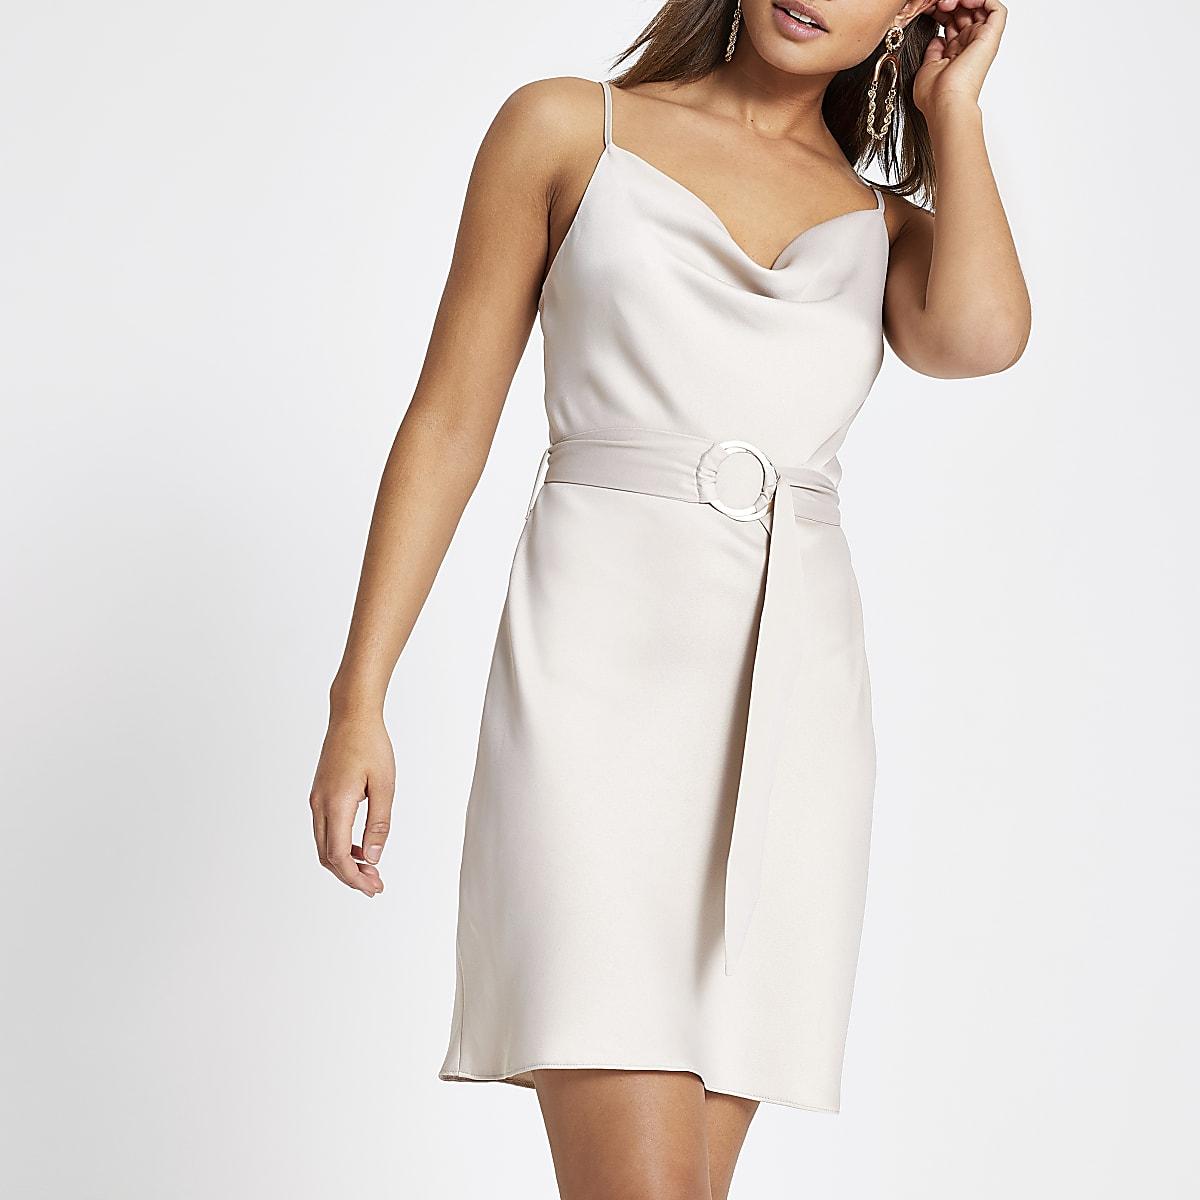 6c2c2700527ff Beige cowl neck belted slip dress - Slip & Cami Dresses - Dresses - women